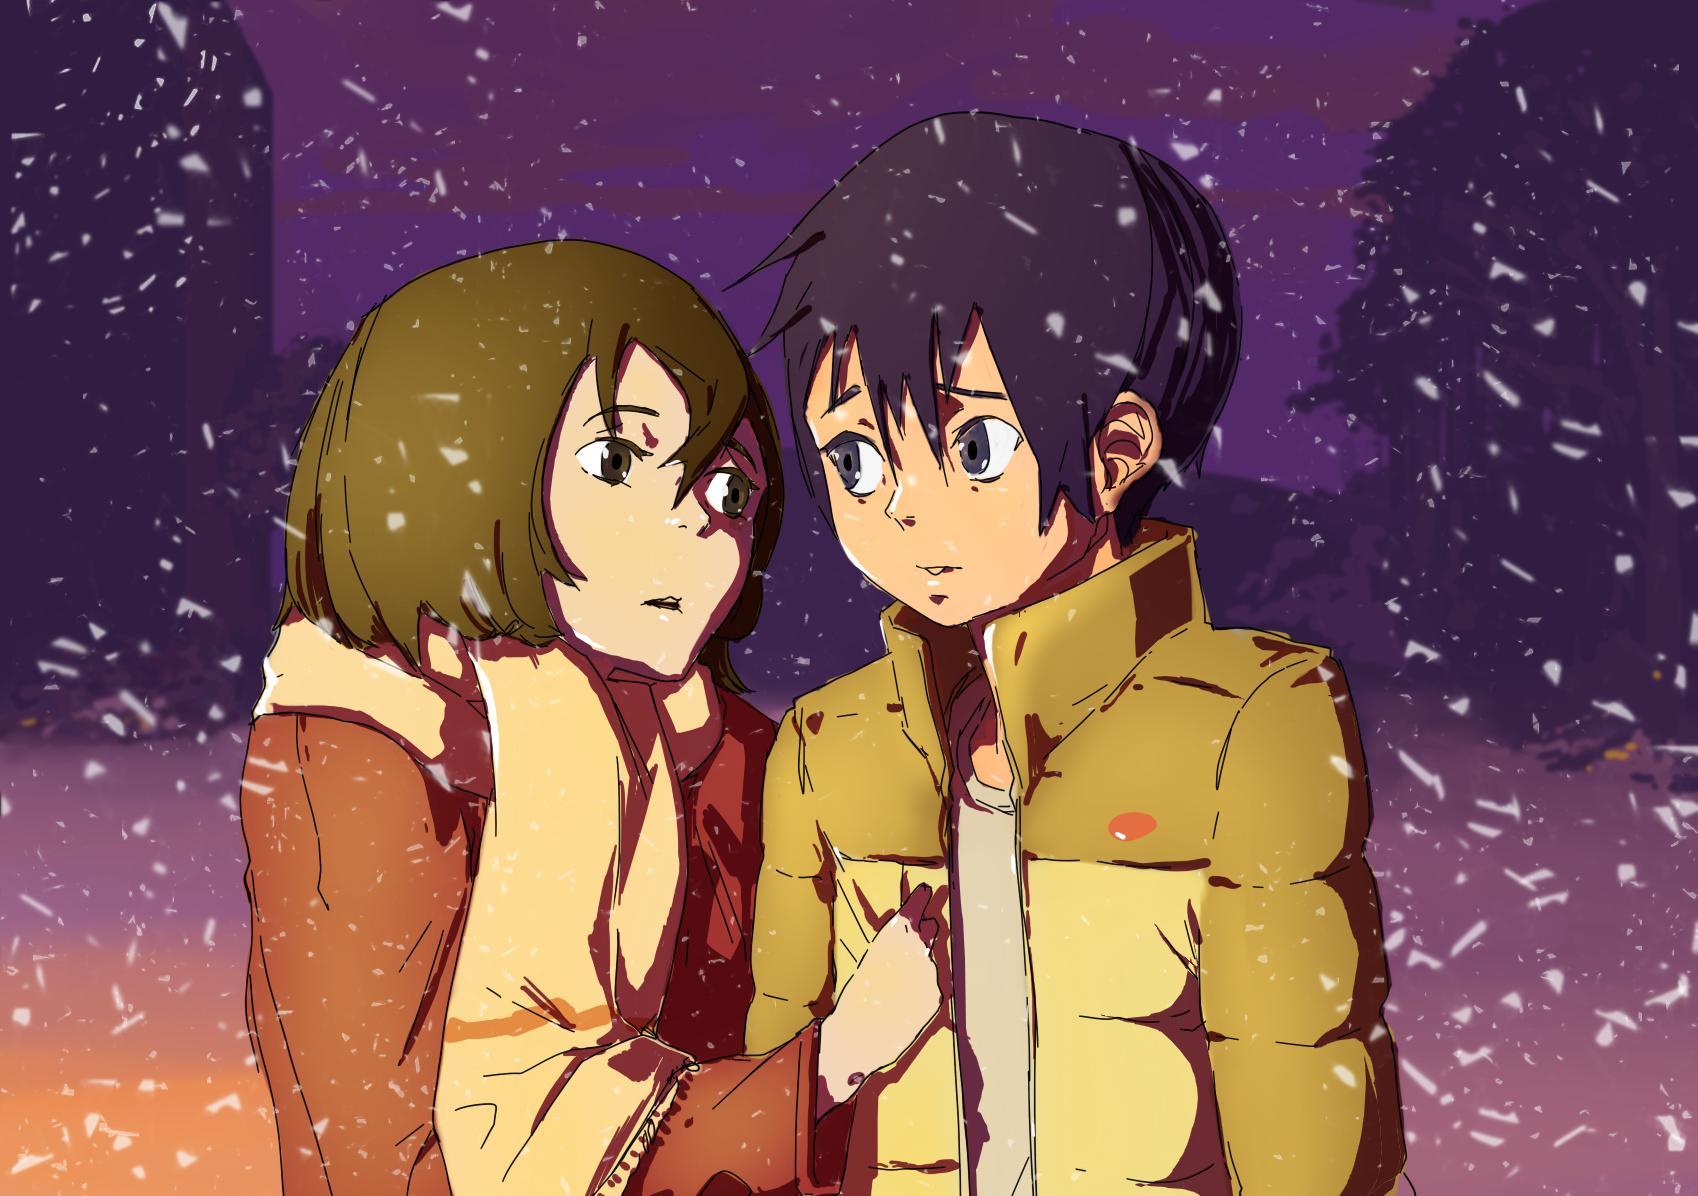 Erased wallpaper hd download - Fanart anime wallpaper ...